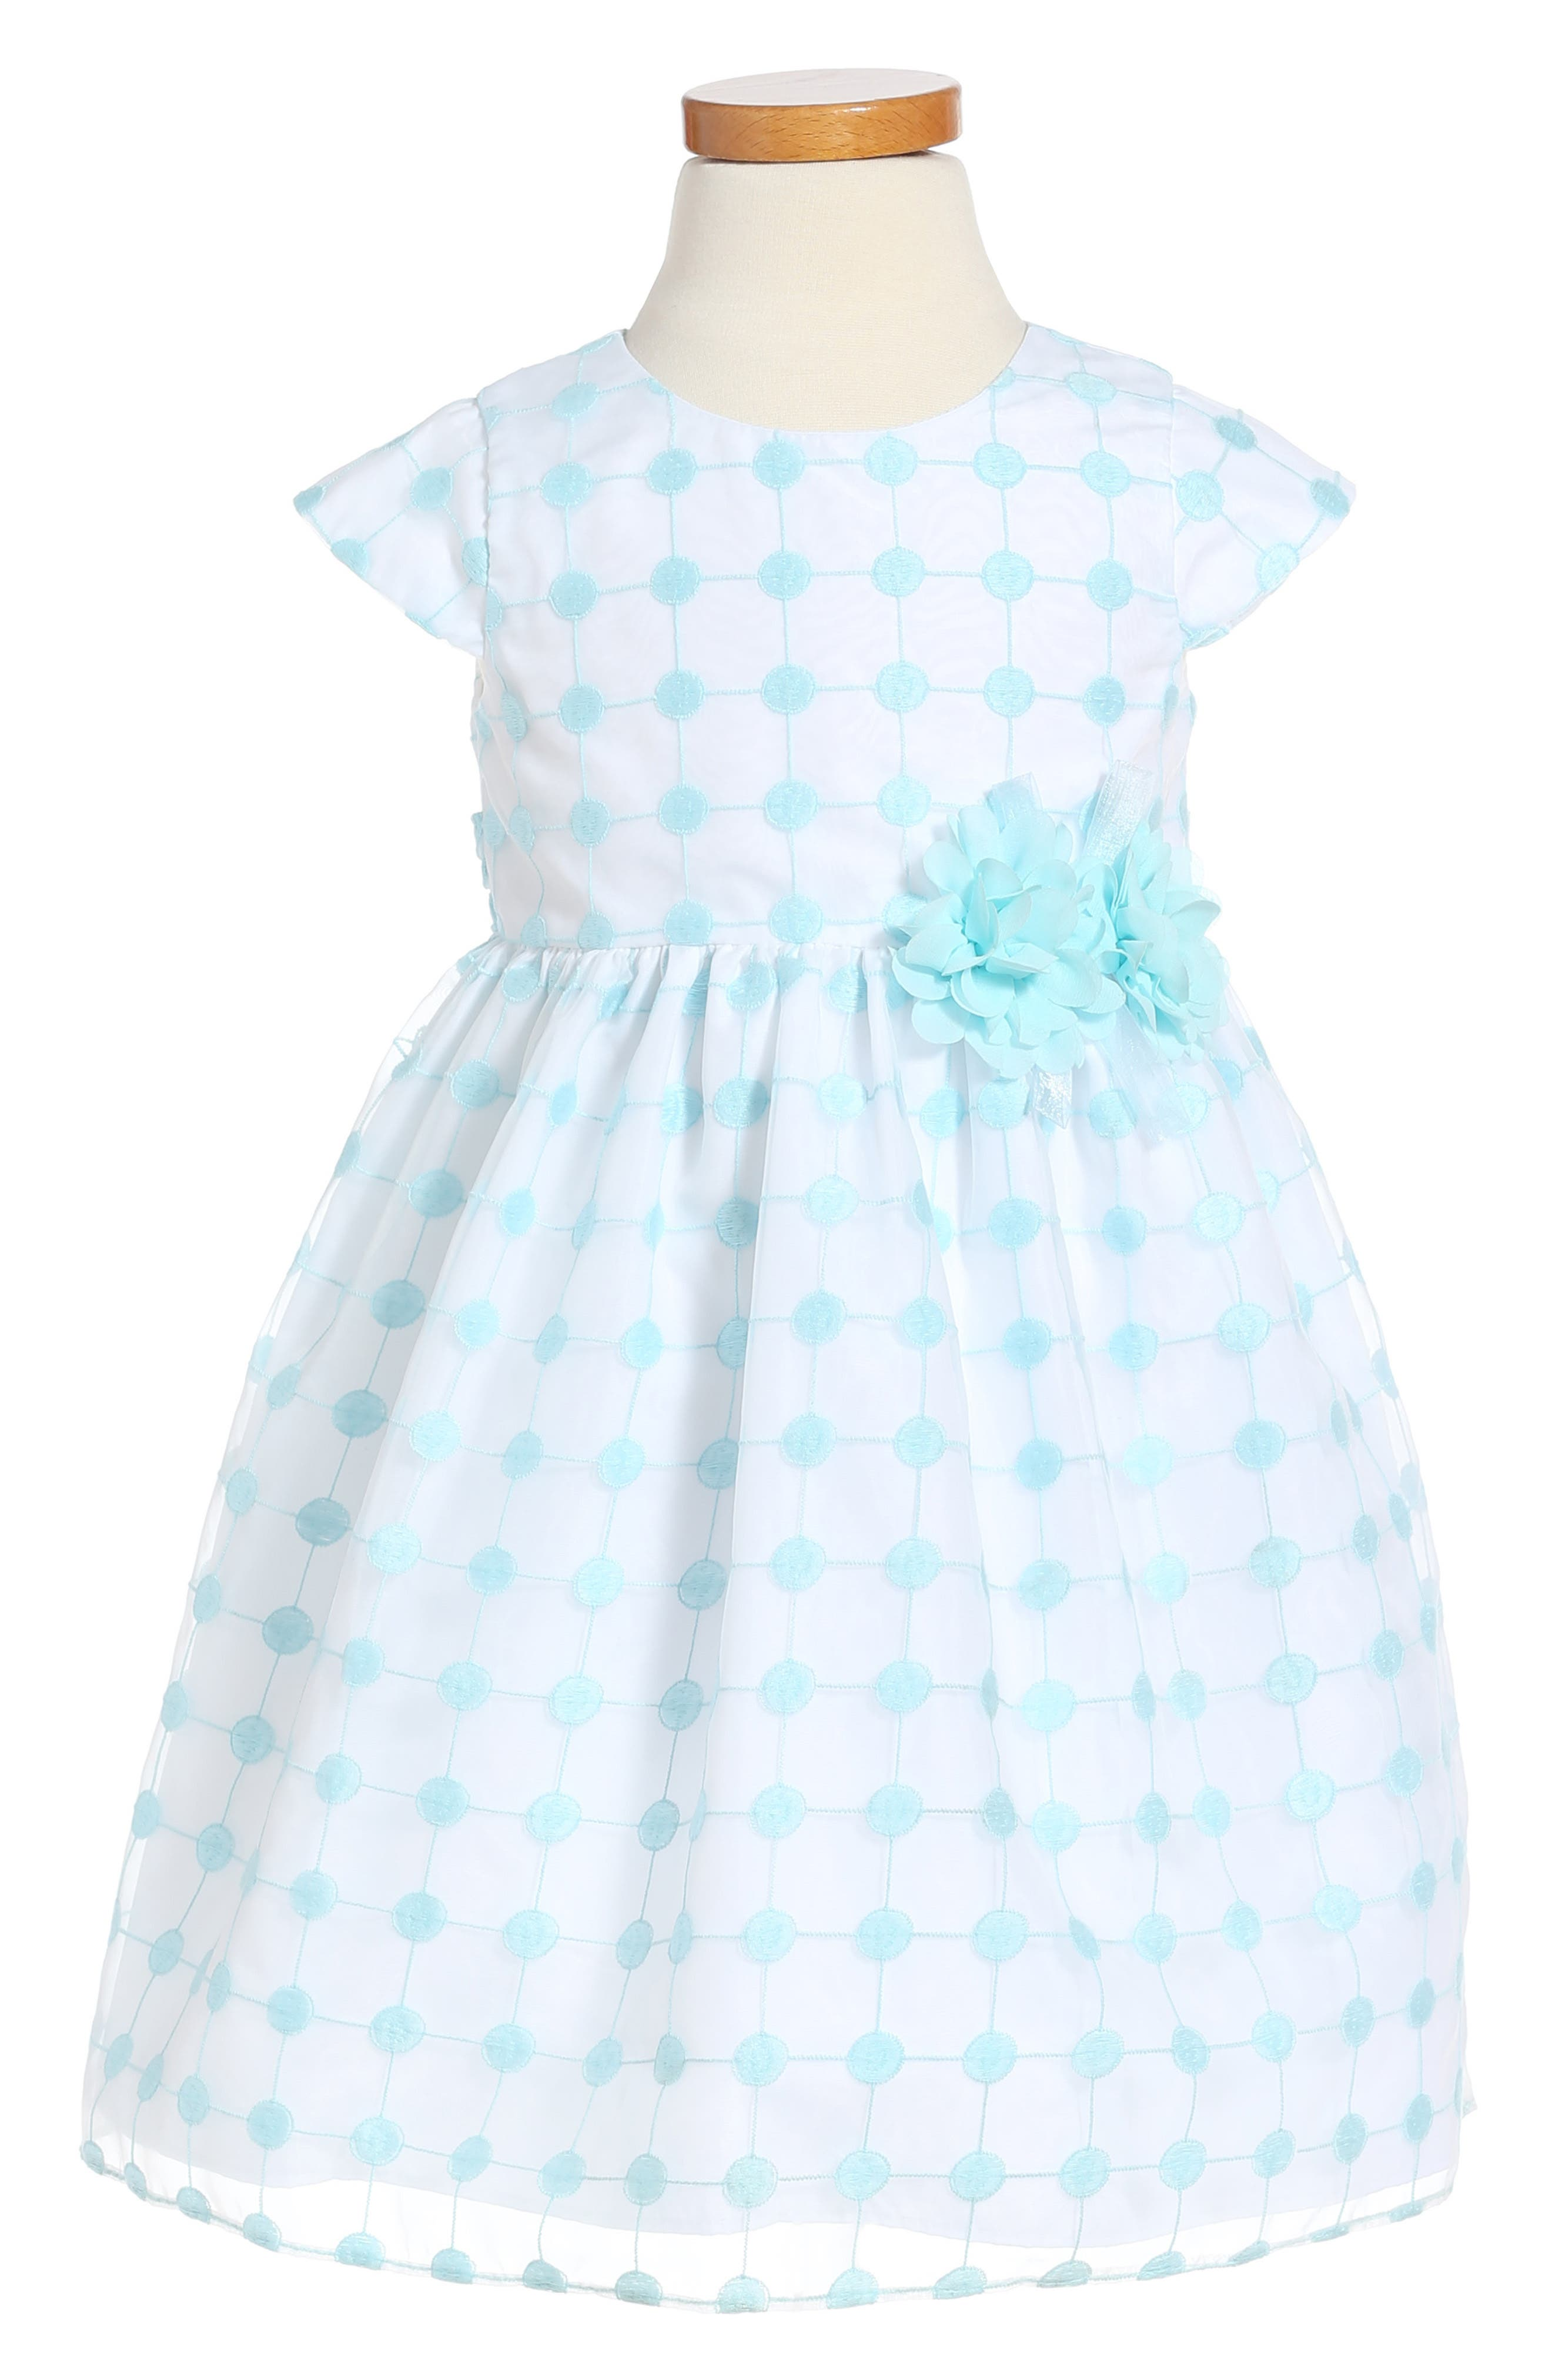 Pippa & Julie Embroidered Mesh Dress (Toddler Girls)